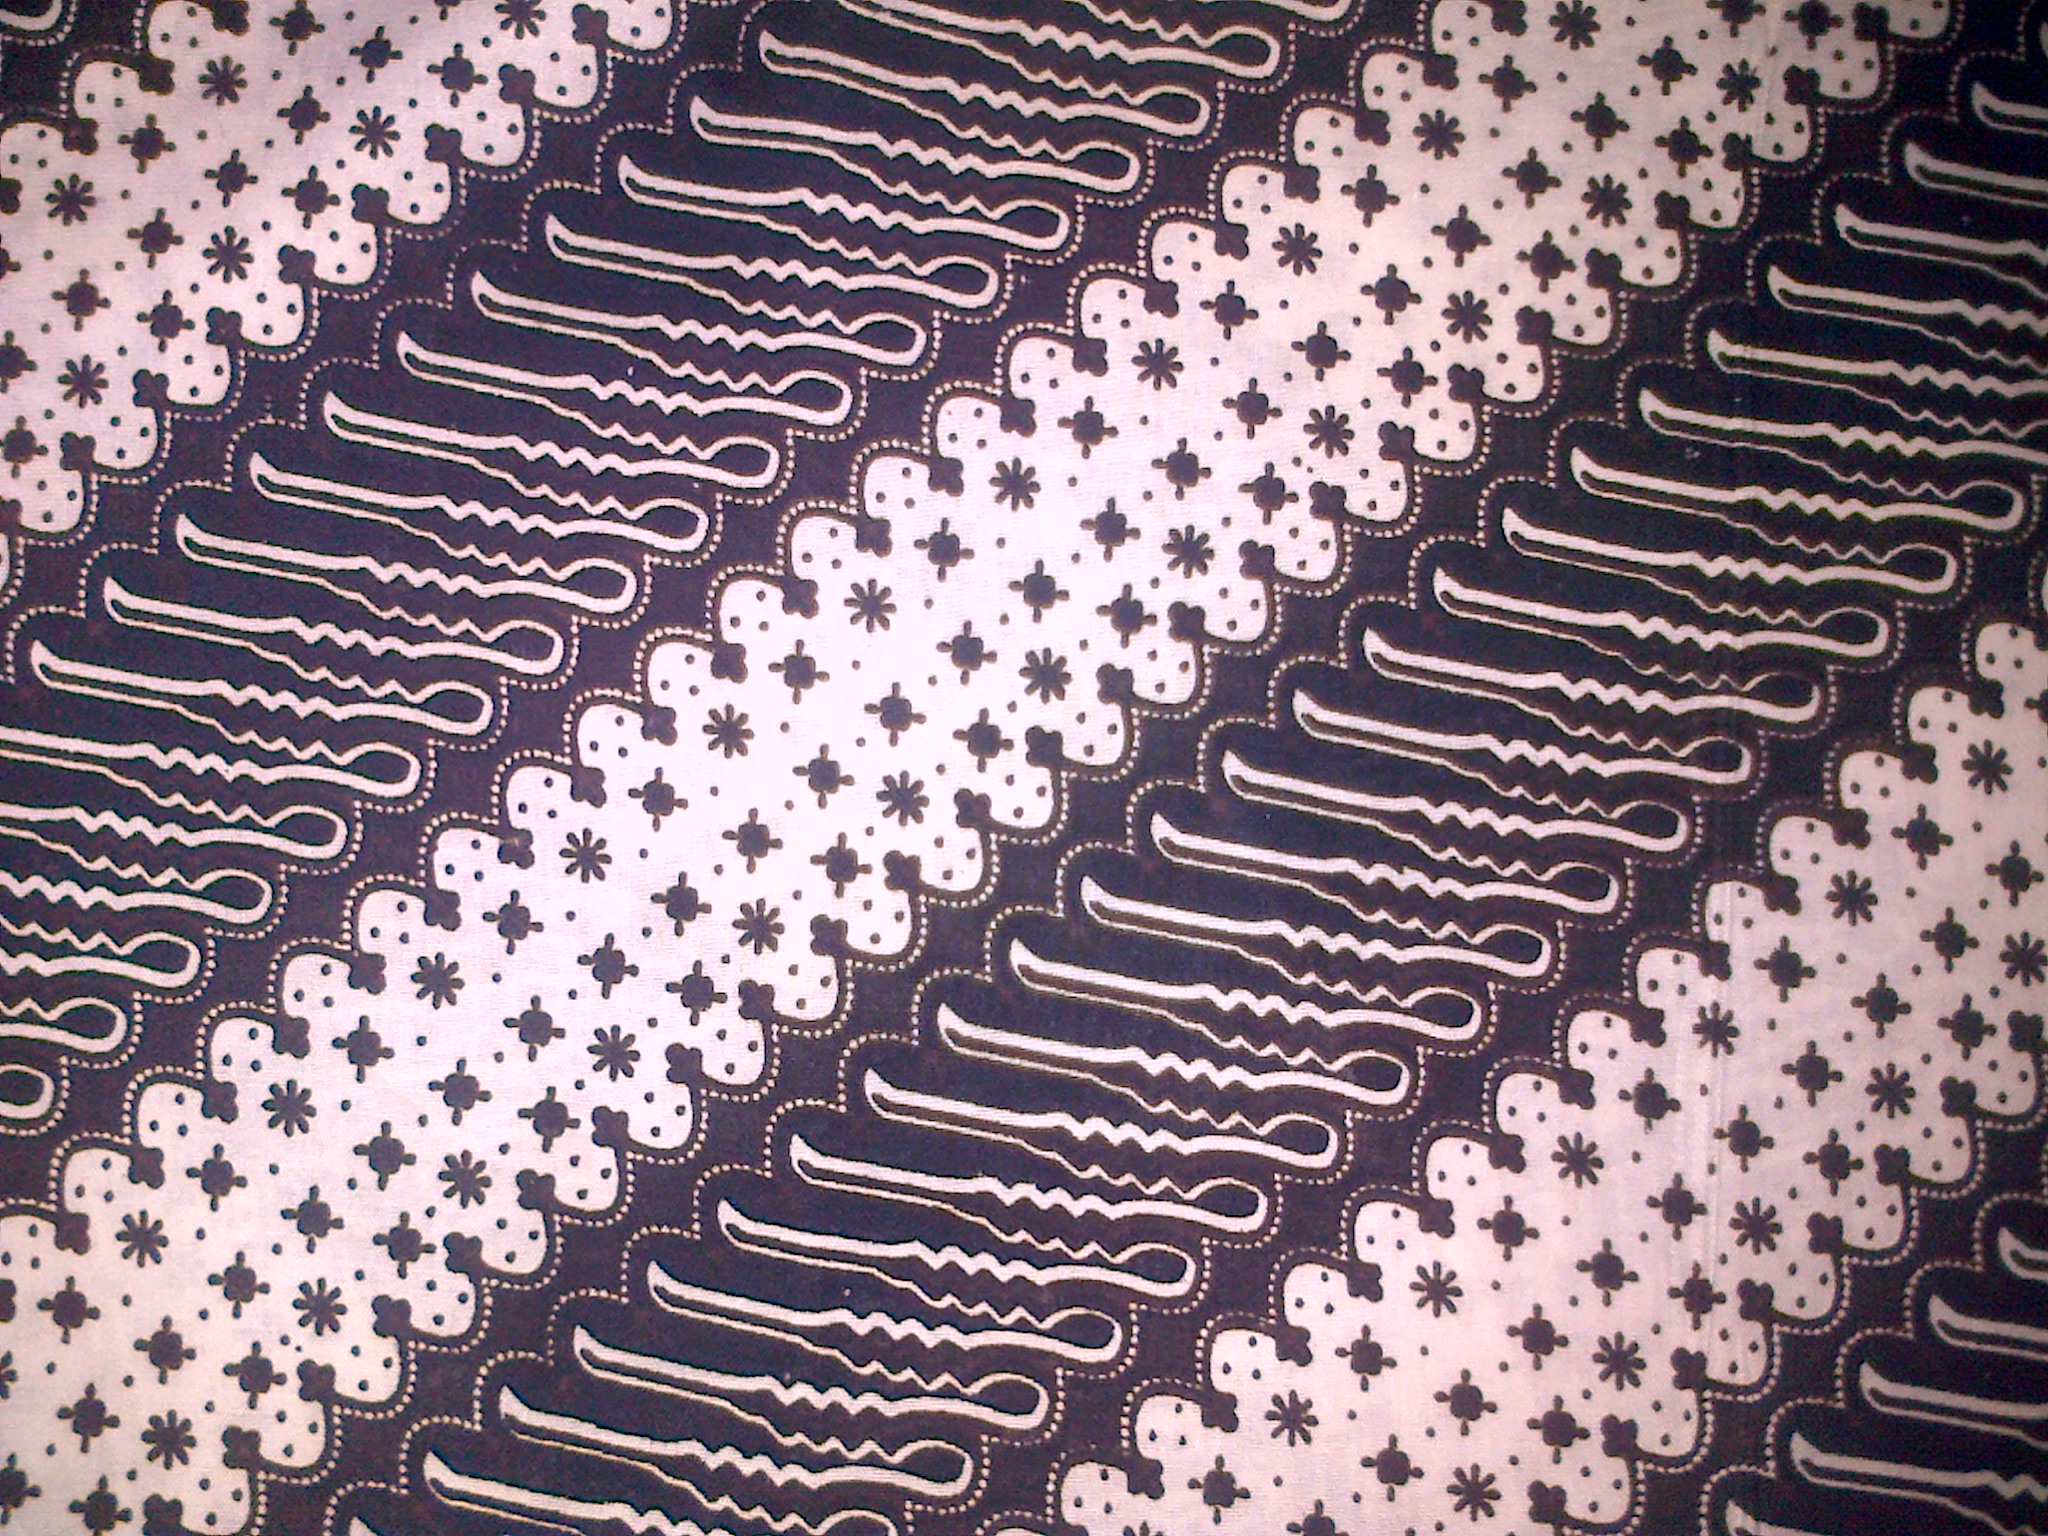 Kain Batik Modern Baju batik modern pekalongan